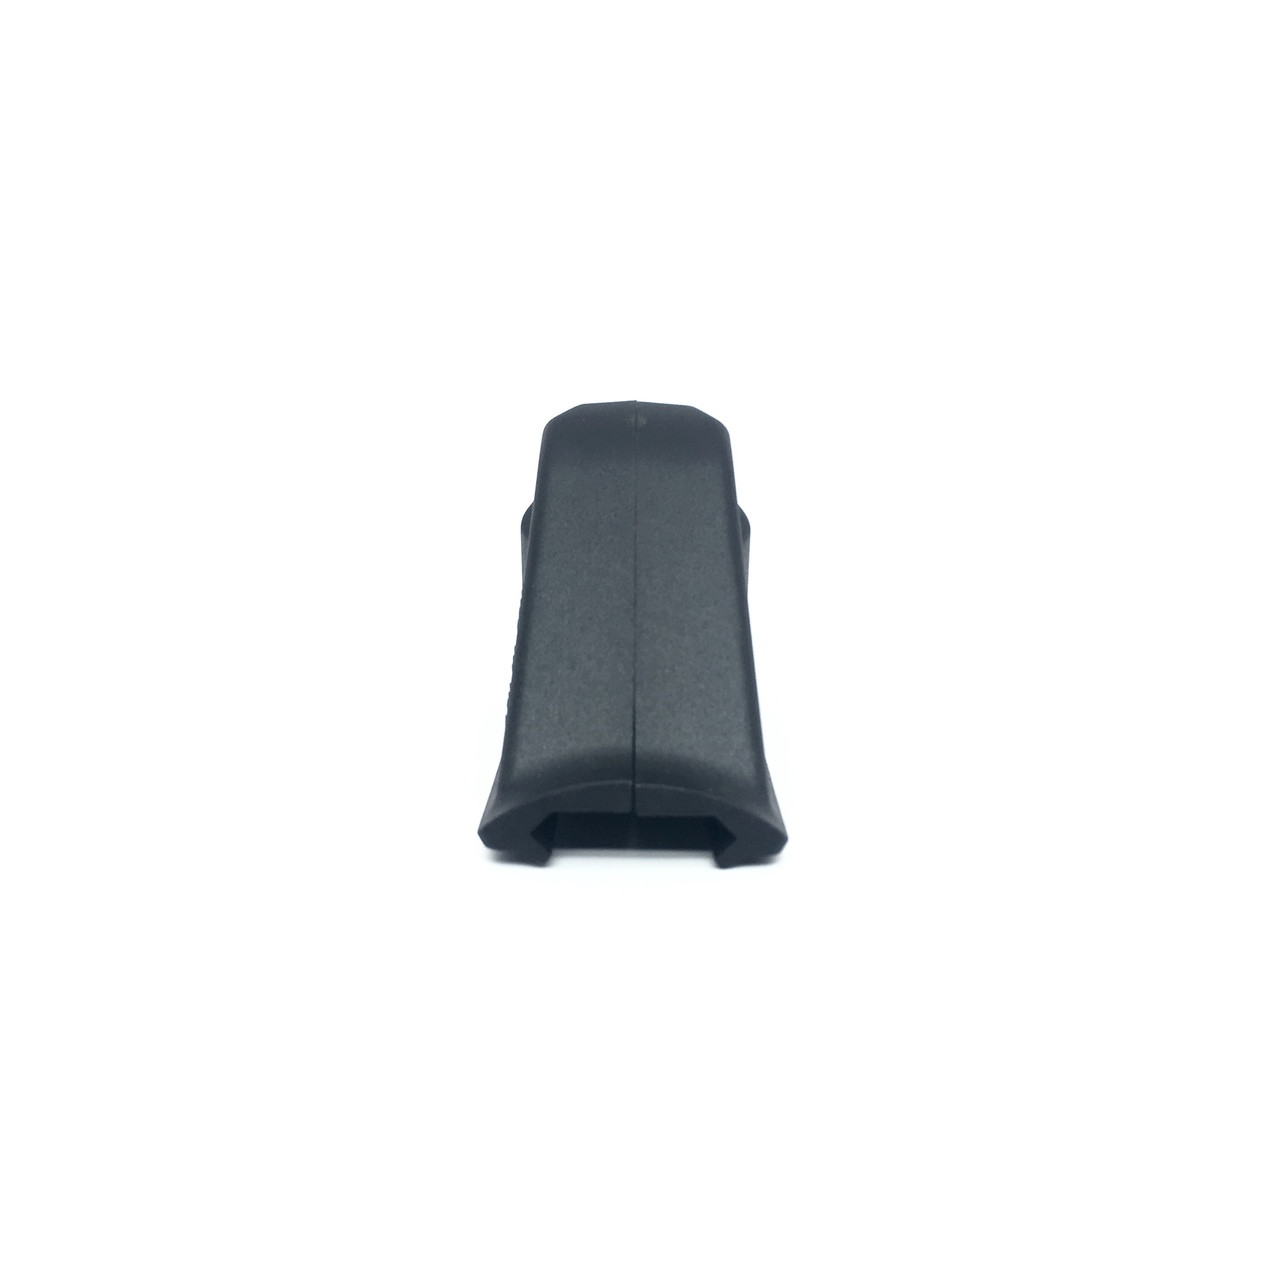 Angled Forward Grip (AFG)